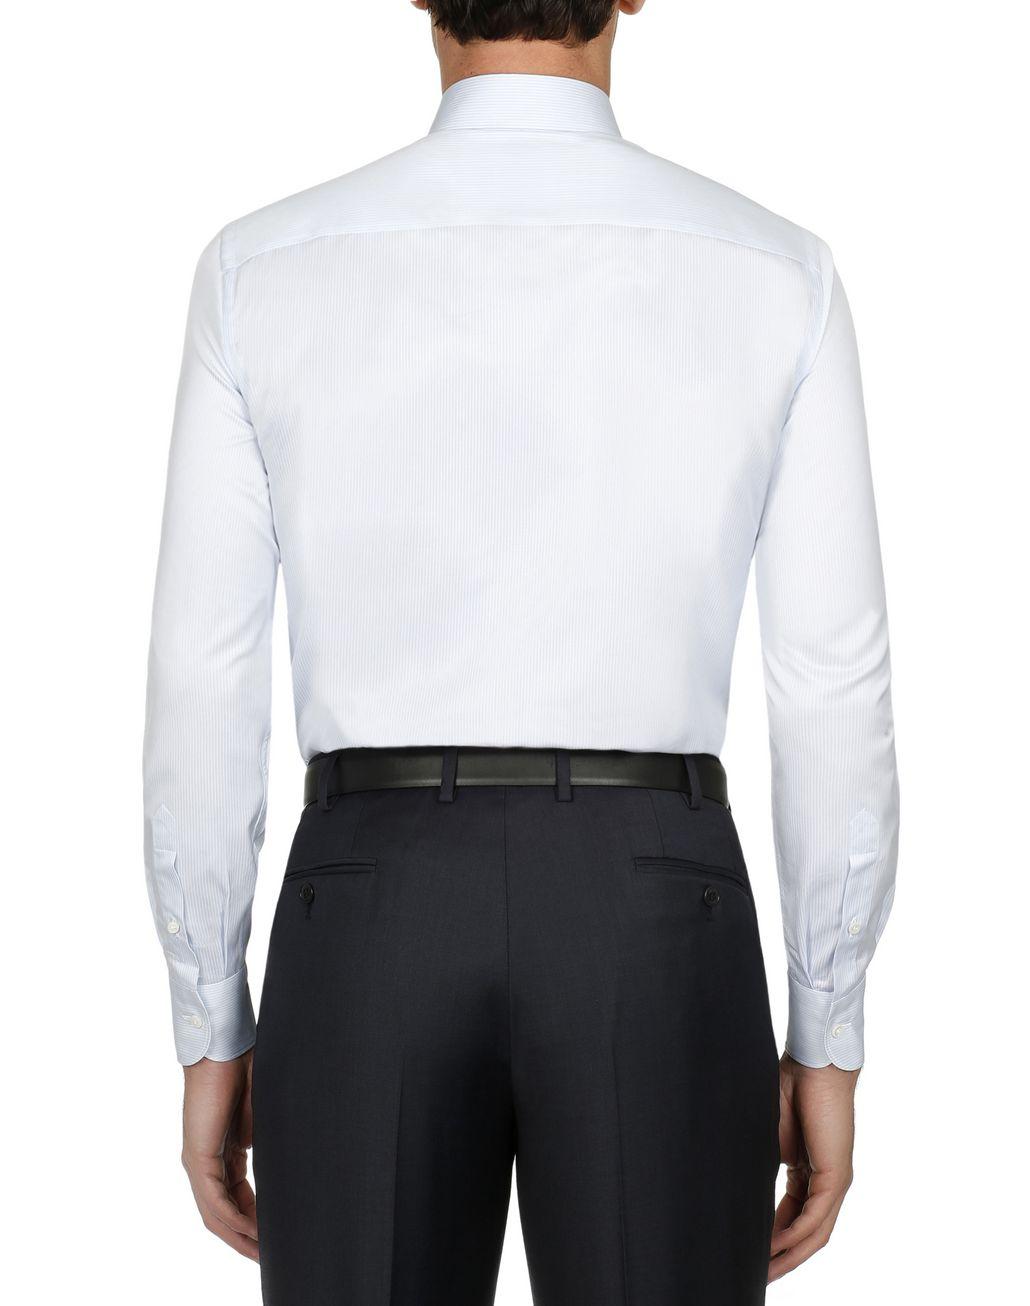 BRIONI Chemise rayée blanc et bleu ciel Chemise habillée [*** pickupInStoreShippingNotGuaranteed_info ***] d